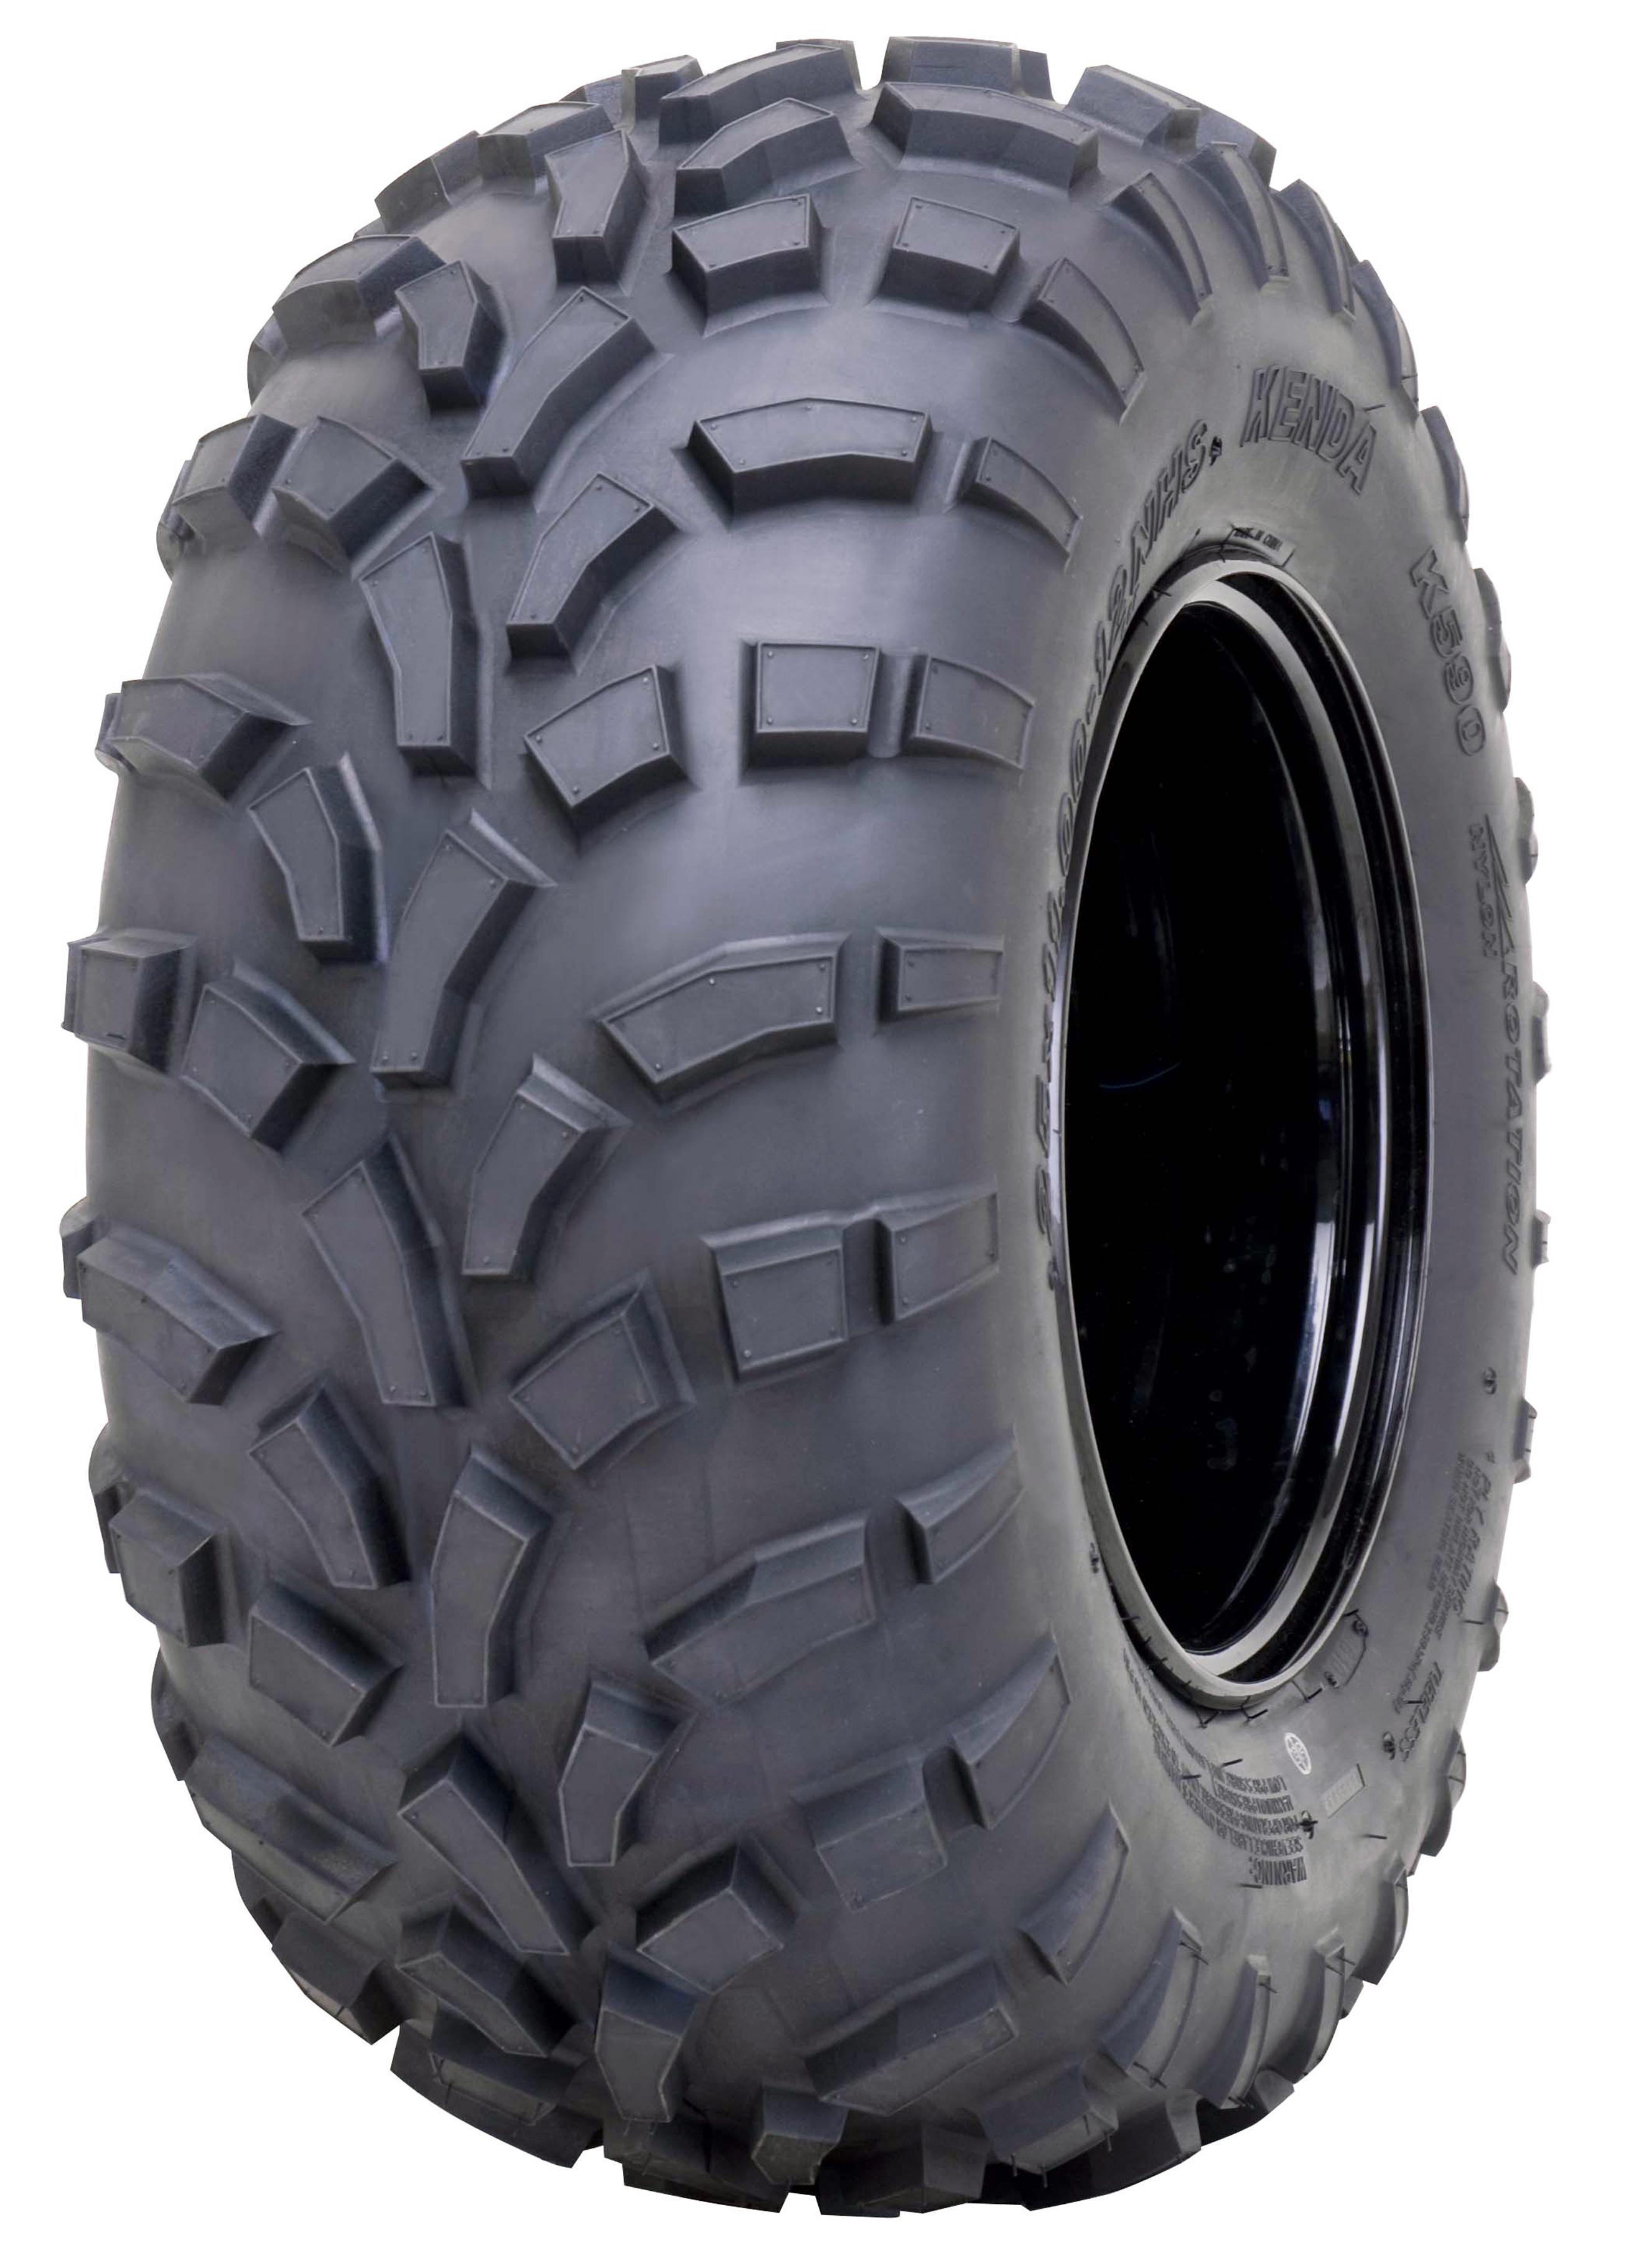 All Terrain / Utility Vehicle Tire